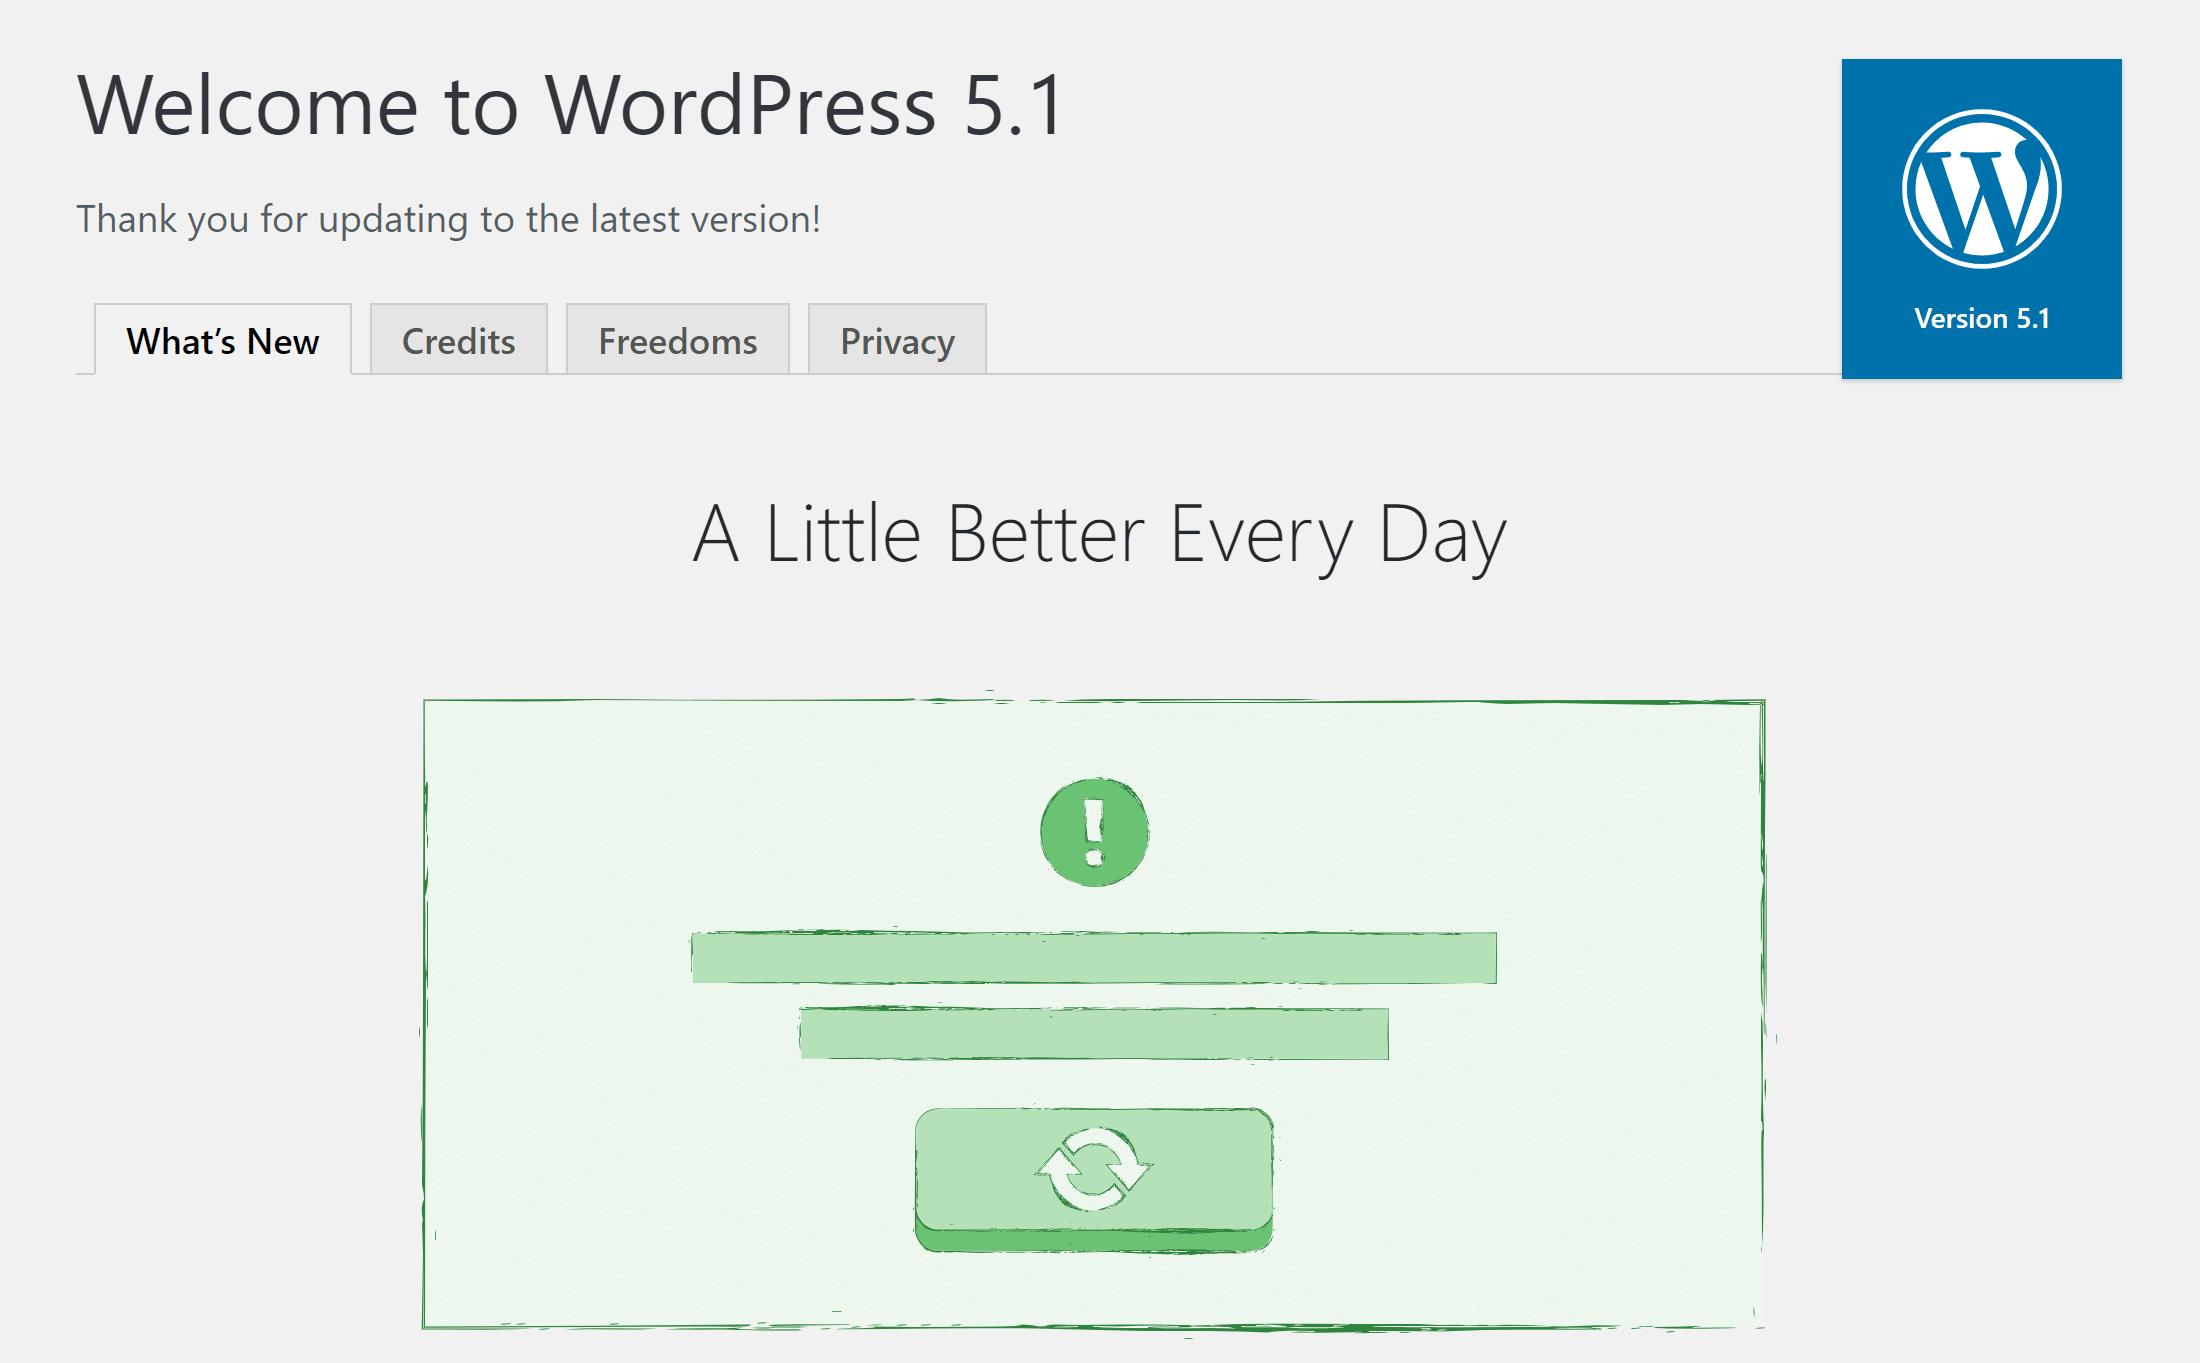 Tela de boas-vindas do WordPress 5.1